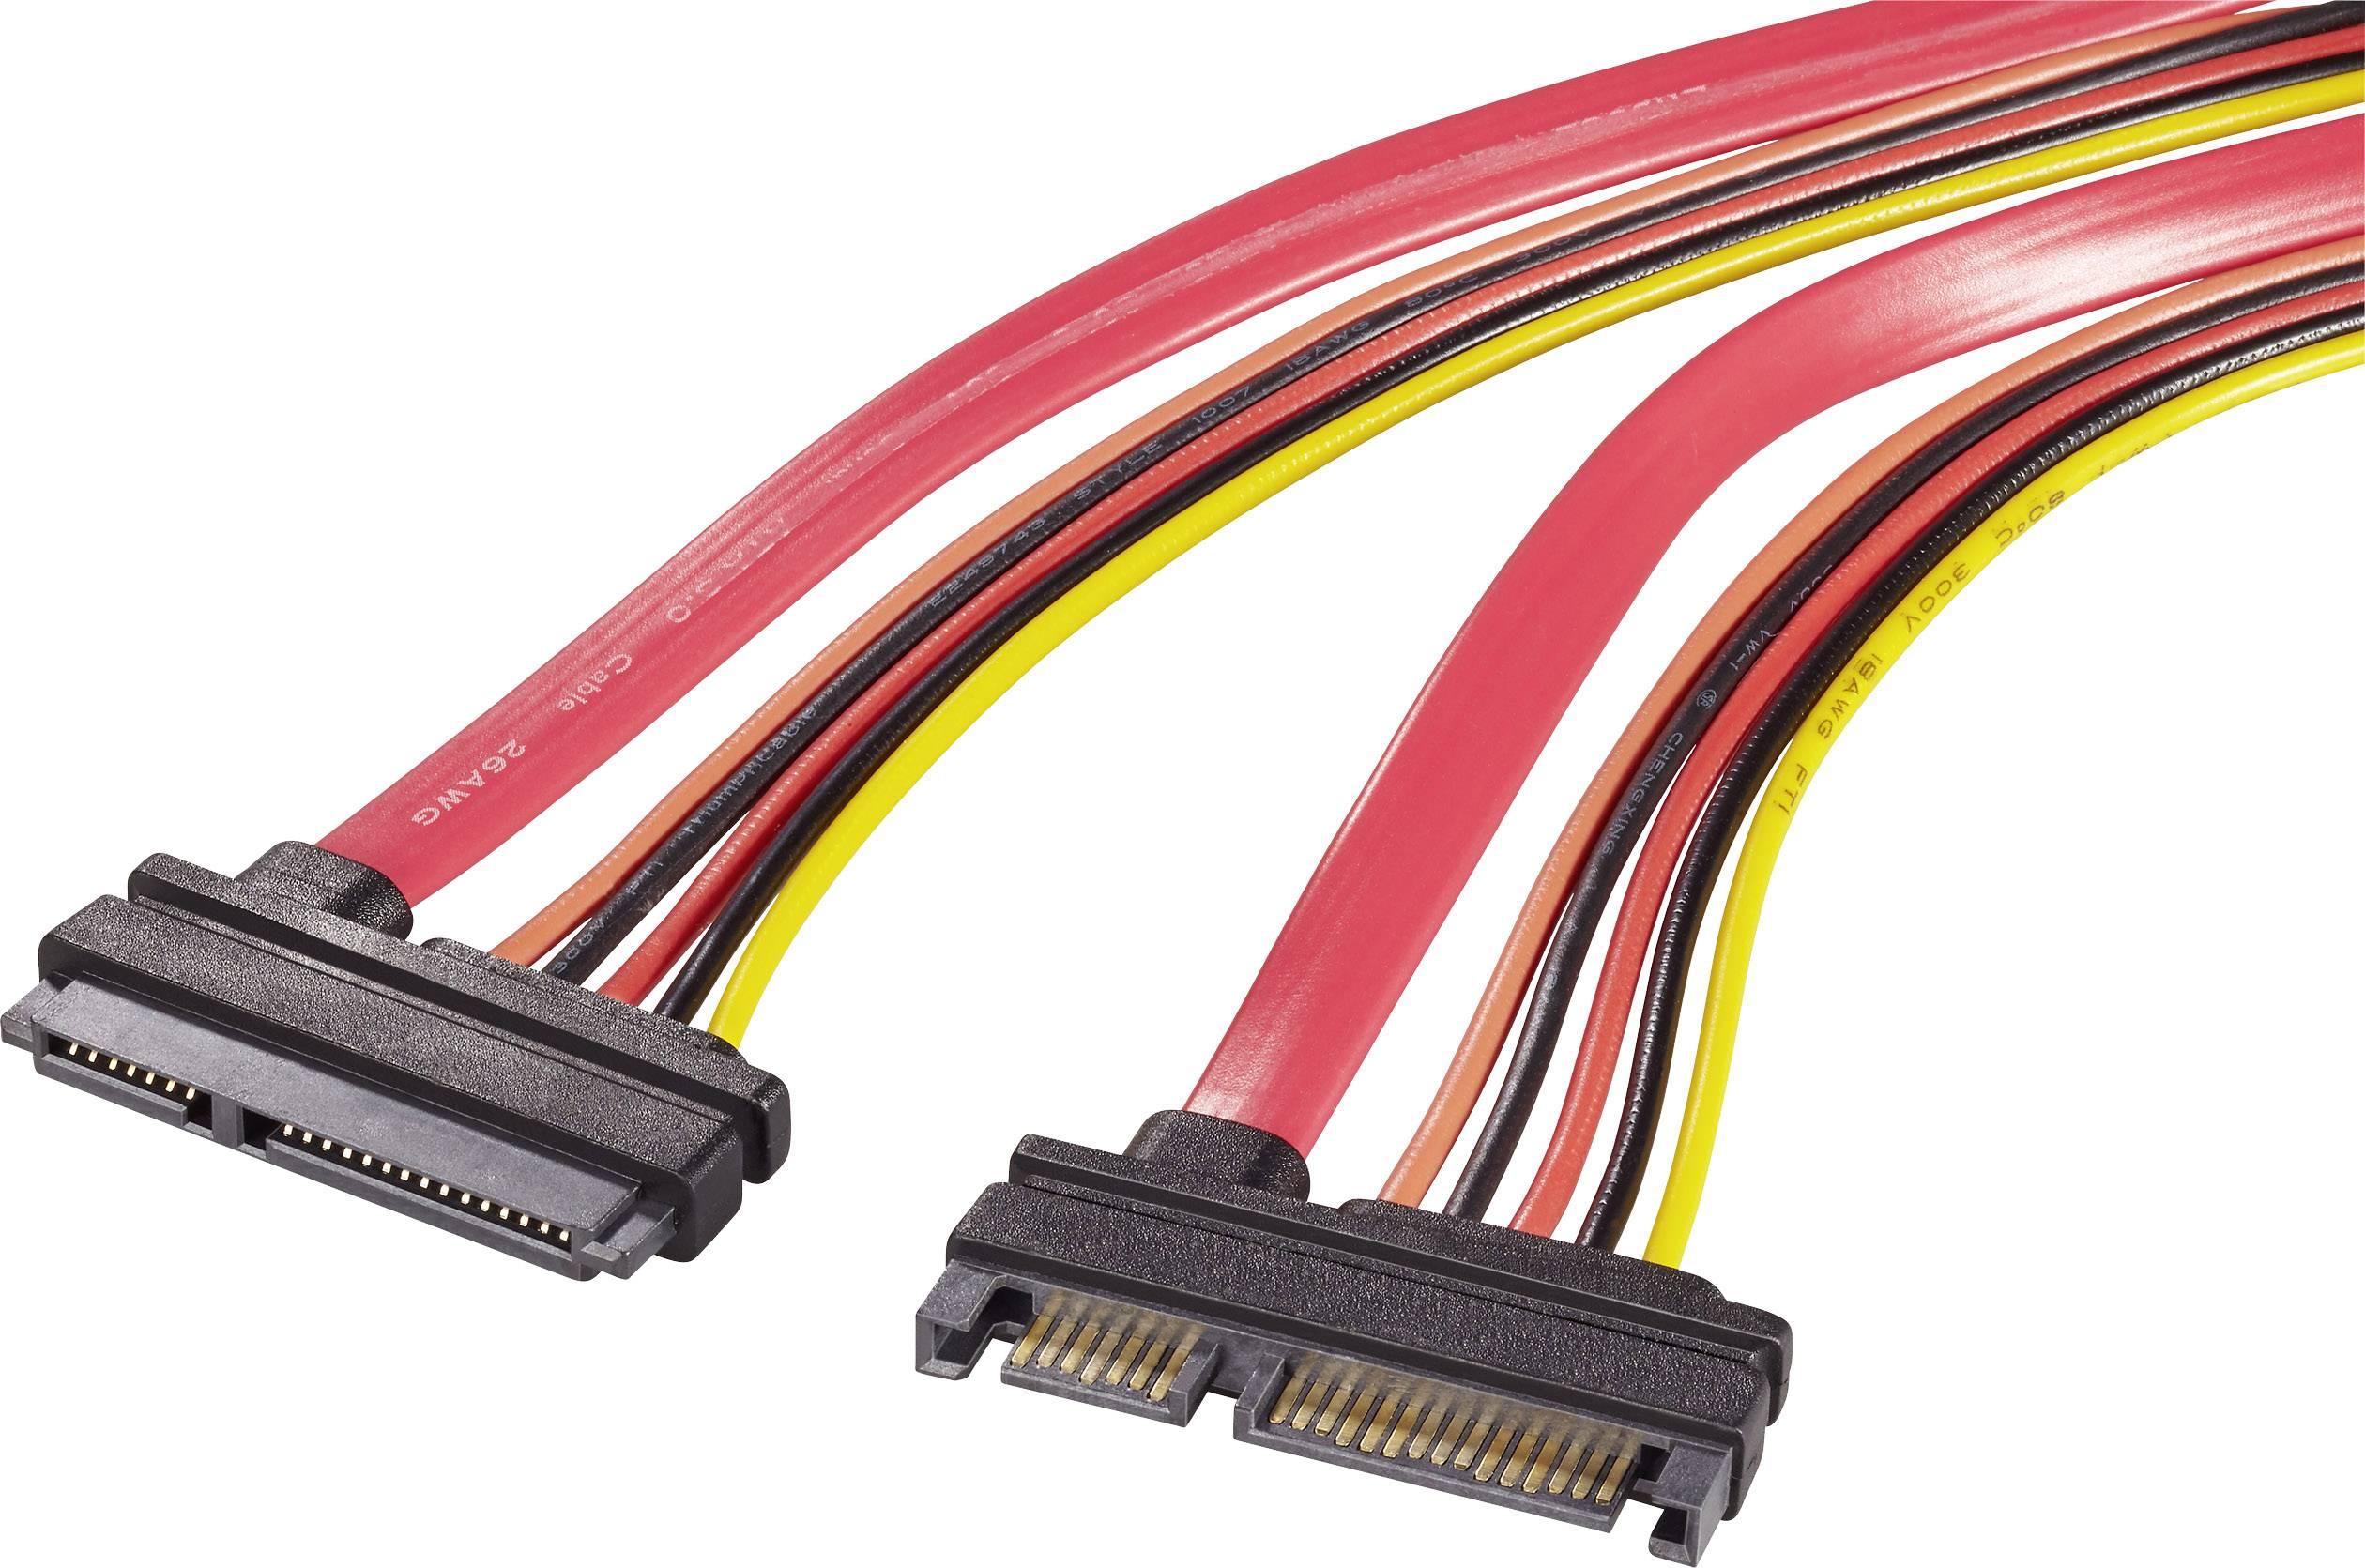 SATA II predlžovací kábel Renkforce RF-4174578, červená, oranžová, čierna, žltá